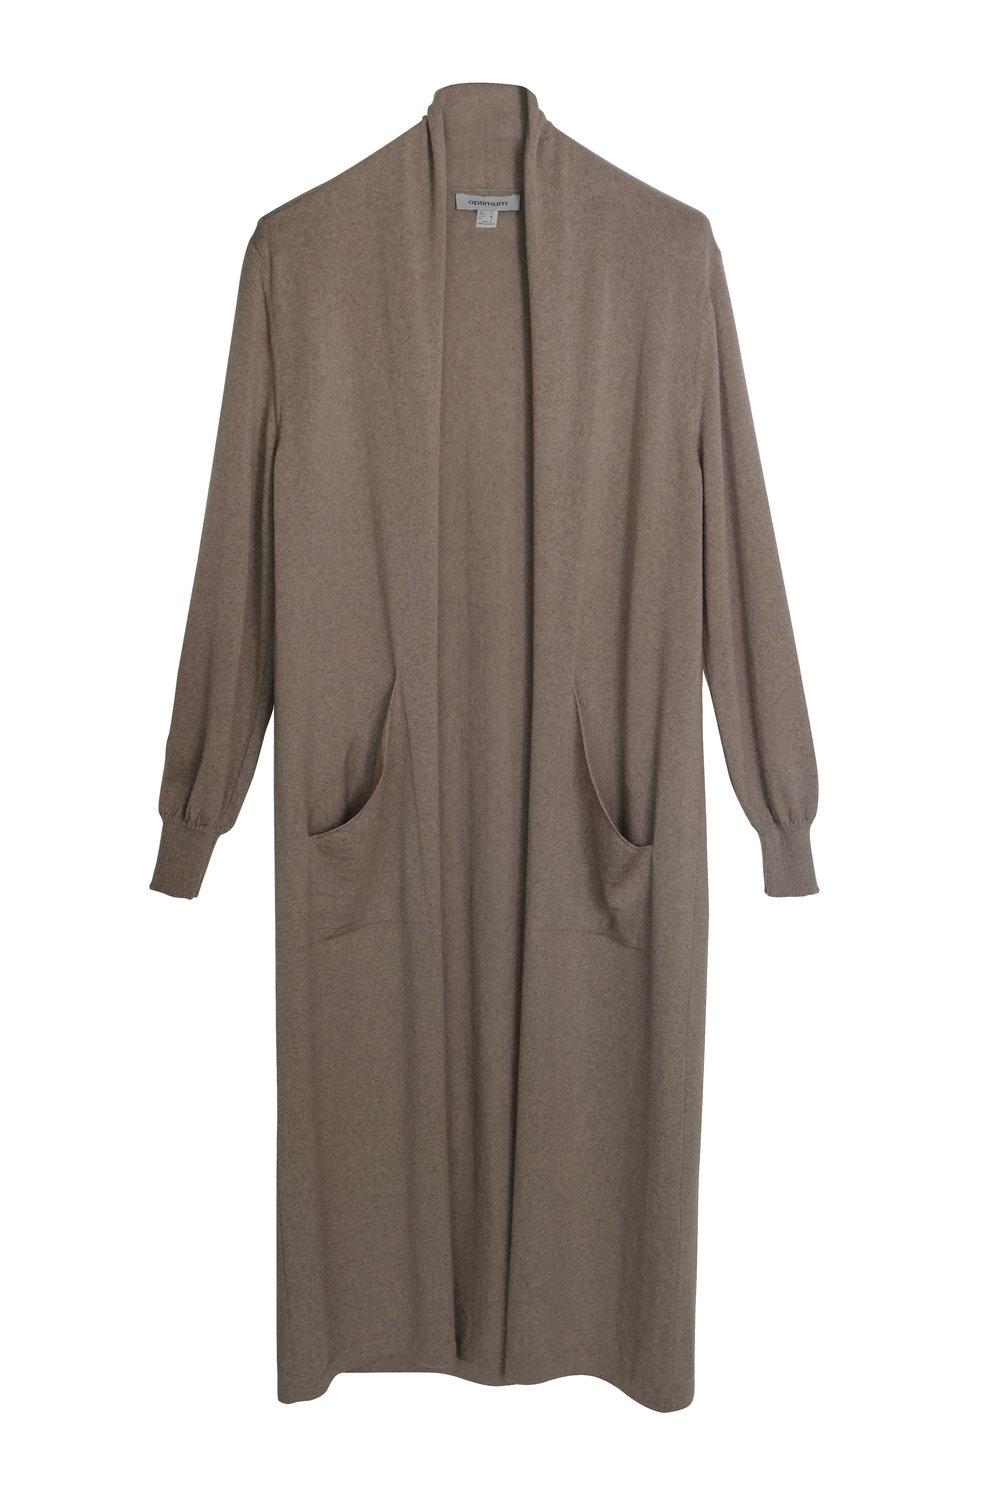 Optimum Knitwear   Duster, $375.